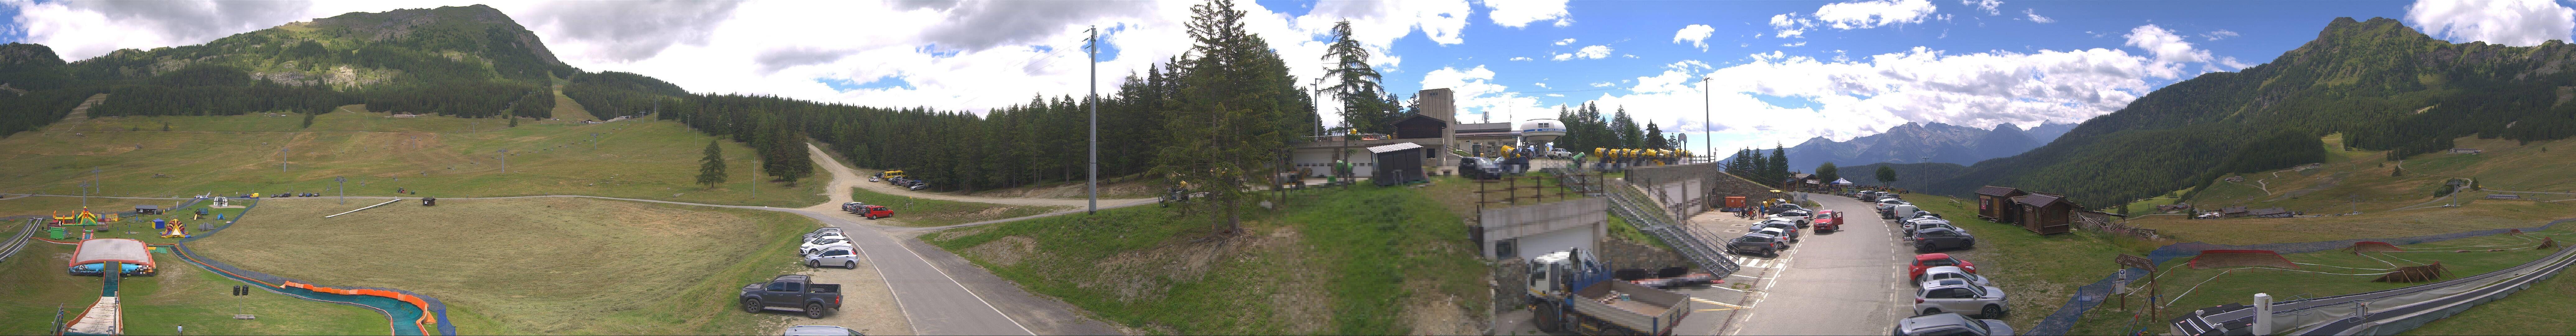 Torgnon: Cervinia - Chantorne Skiarena